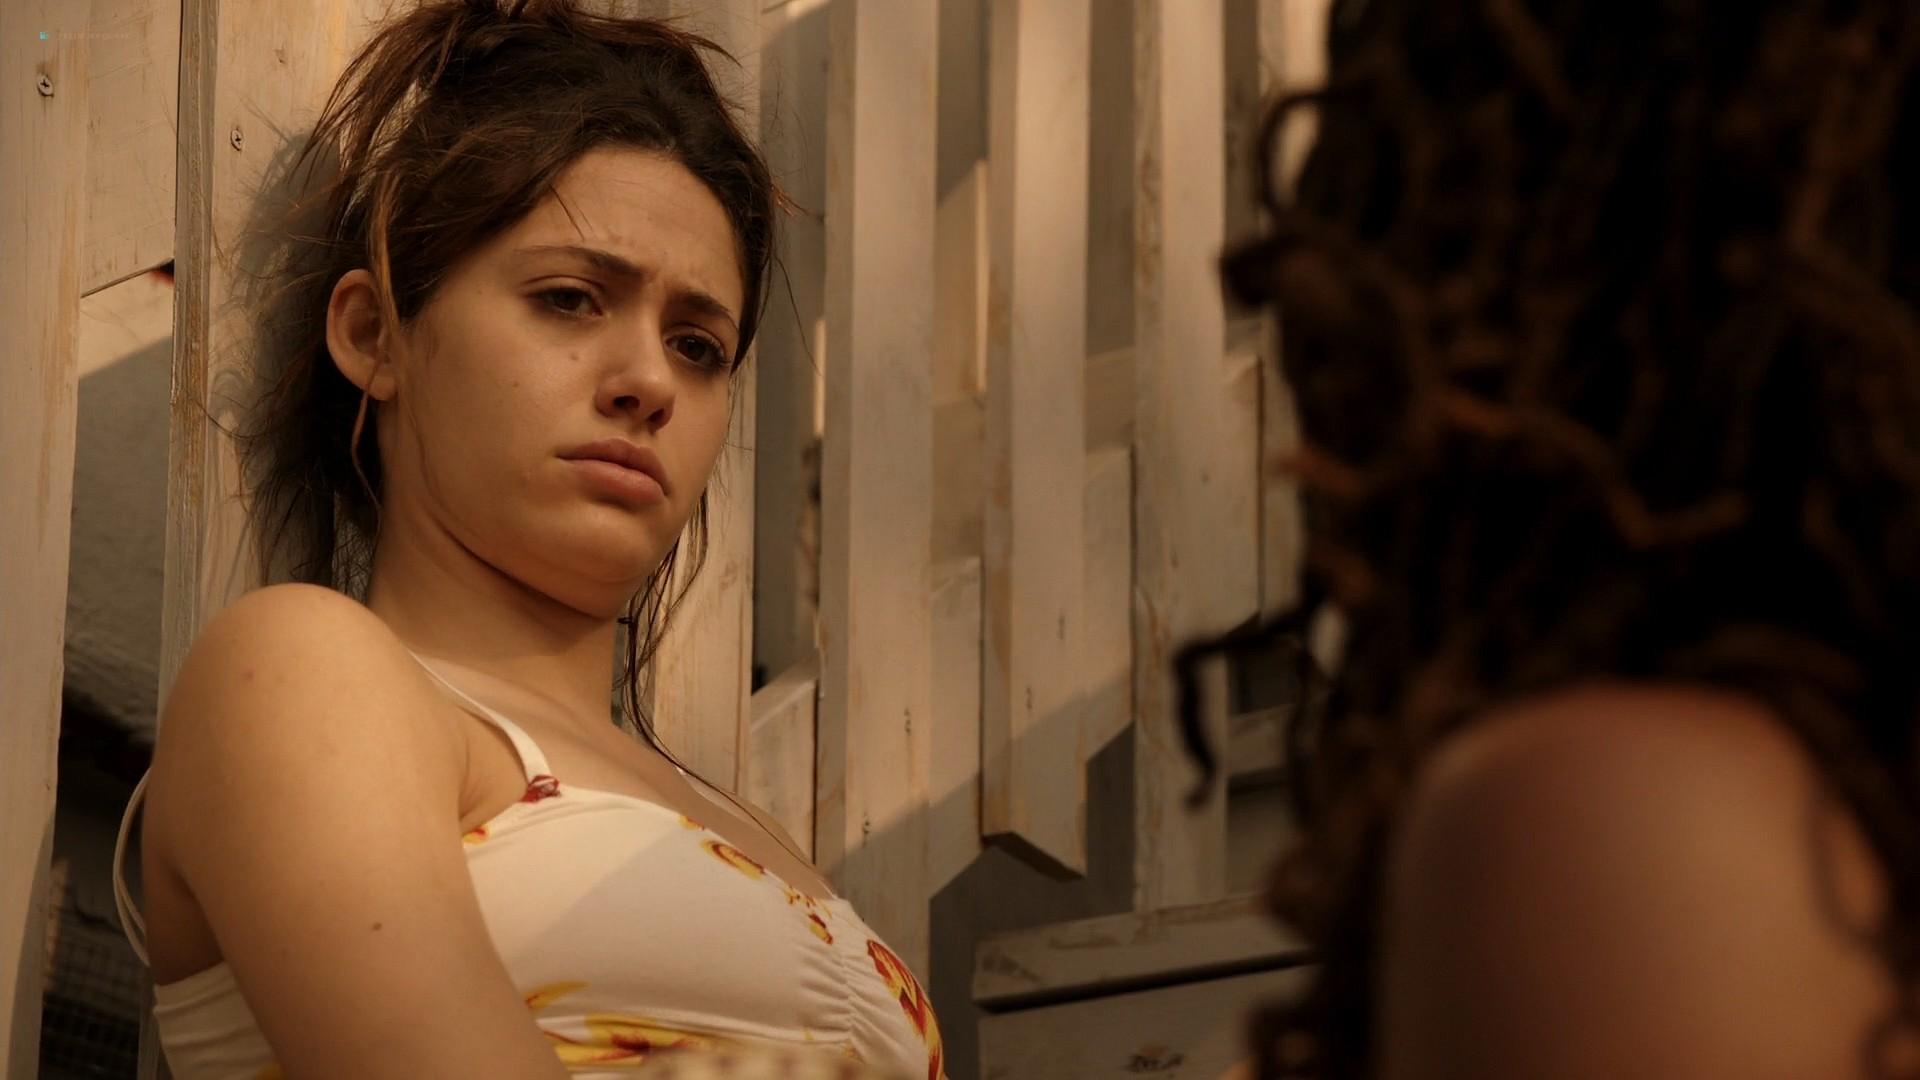 Emmy Rossum nude topless Laura Wiggins nude sex - Shameless (2012) s2e1 HD 1080p BluRay (2)